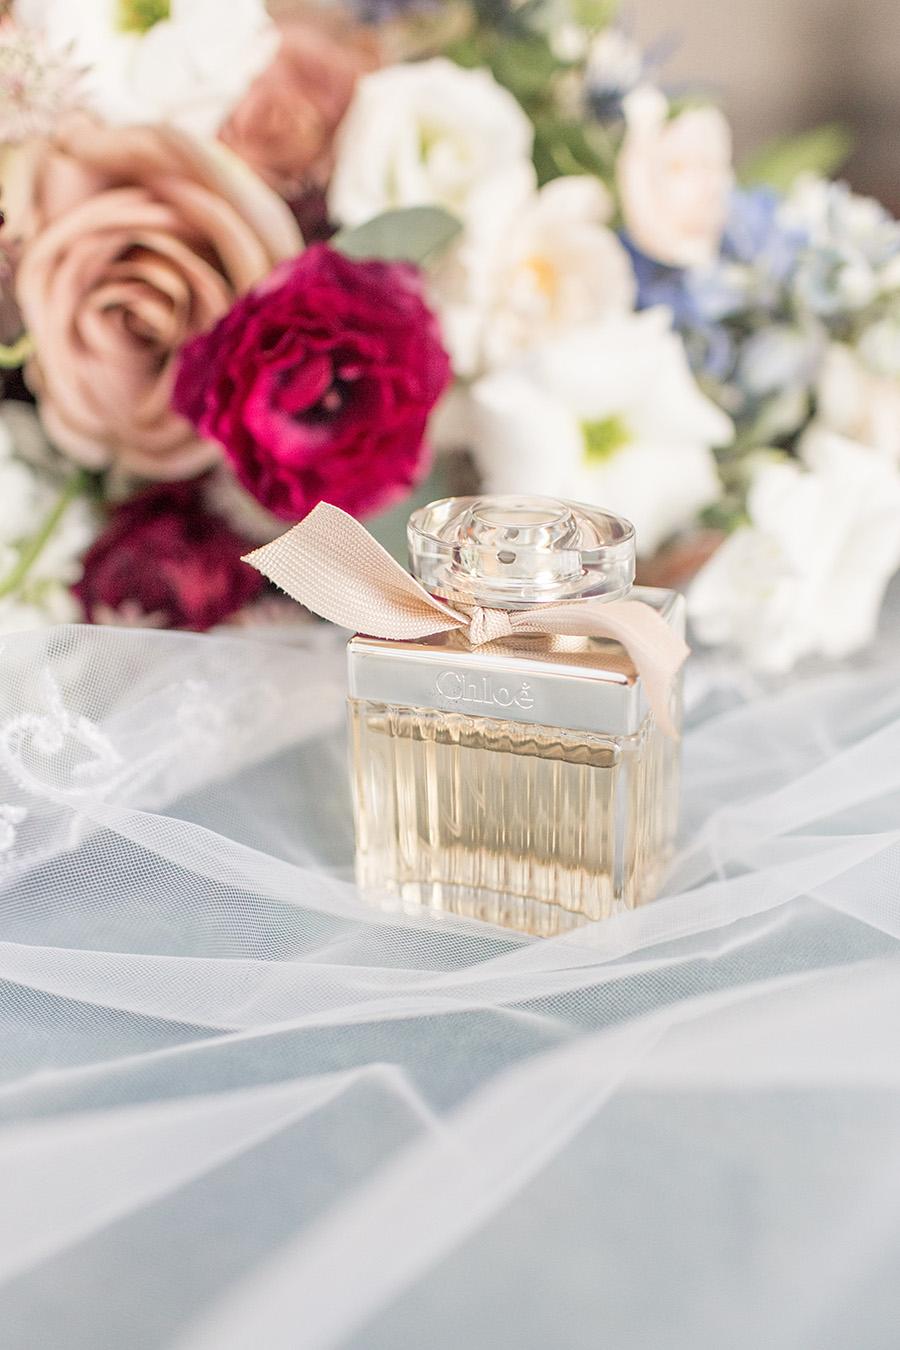 Wedding day perfume